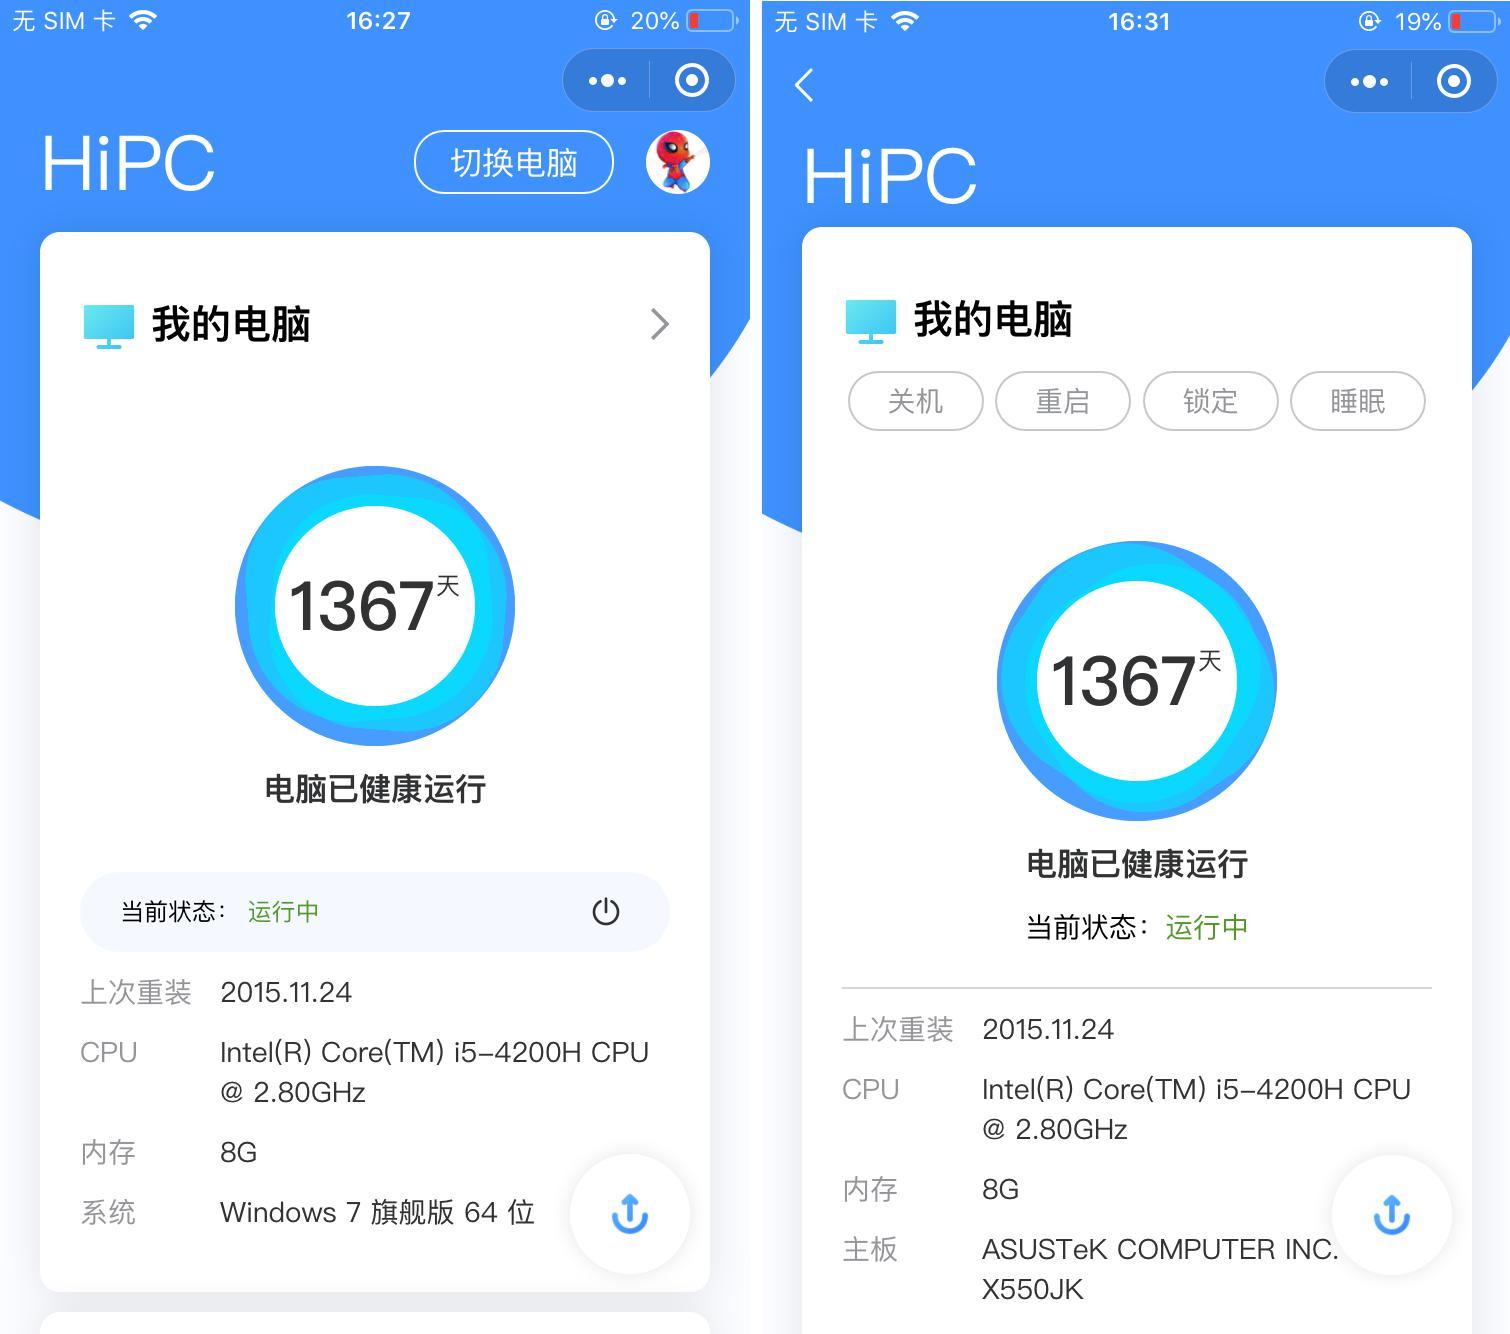 HiPC 4.0.4.81 让你的微信远程控制、监视电脑-第1张图片-分享者 - 优质精品软件、互联网资源分享